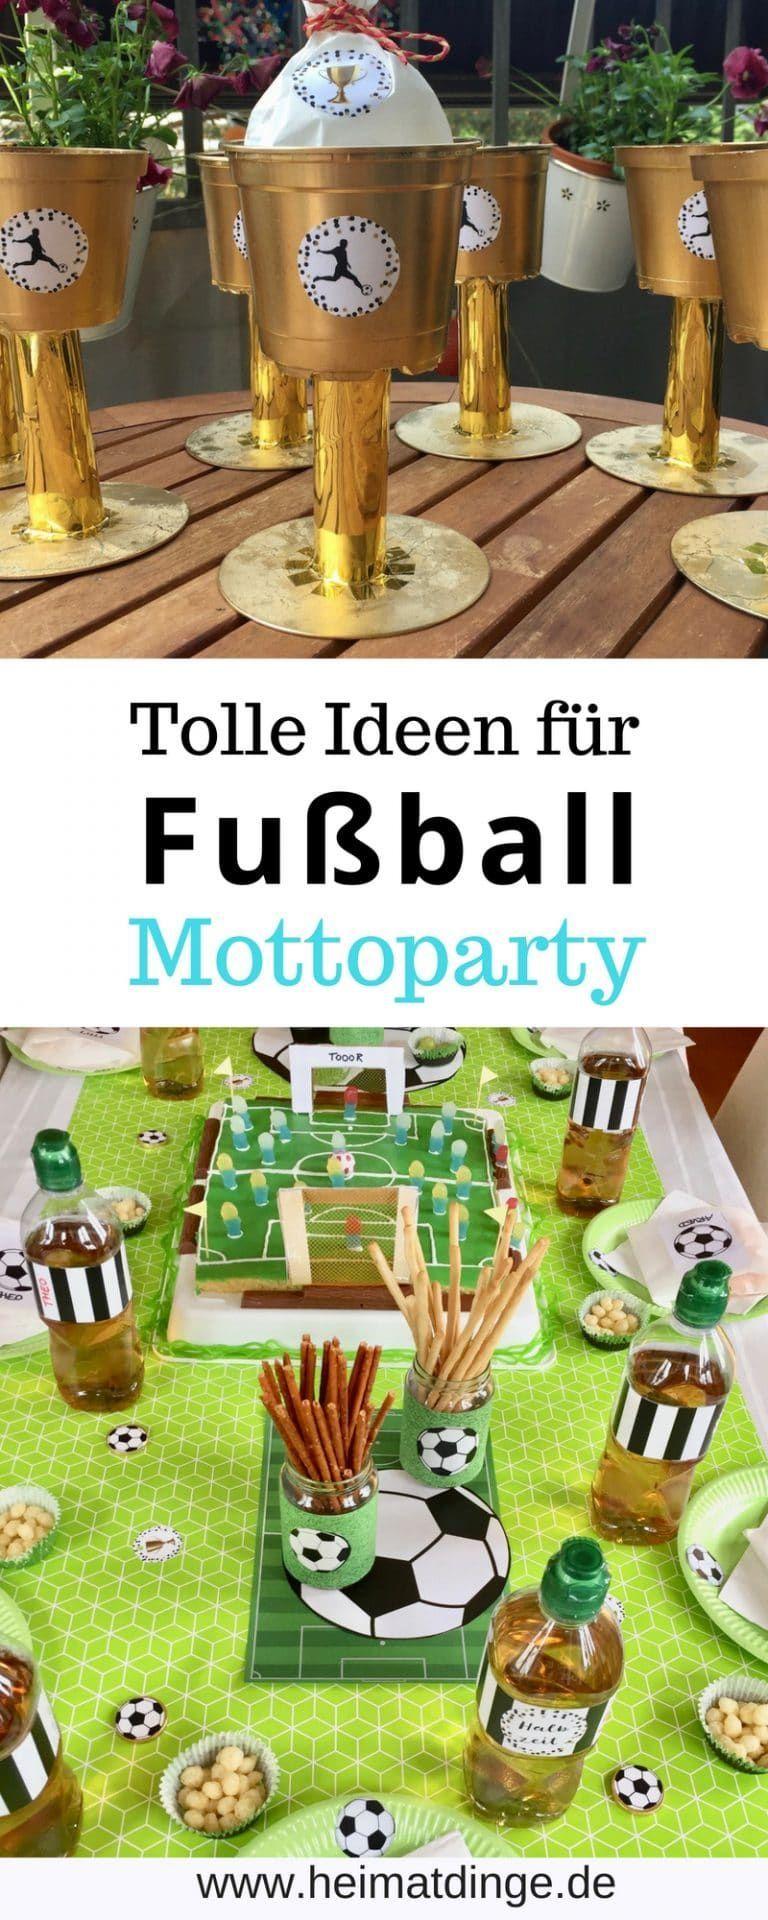 Fussball Geburtstag Ideen Fur Mottoparty Mottoparty Fussball